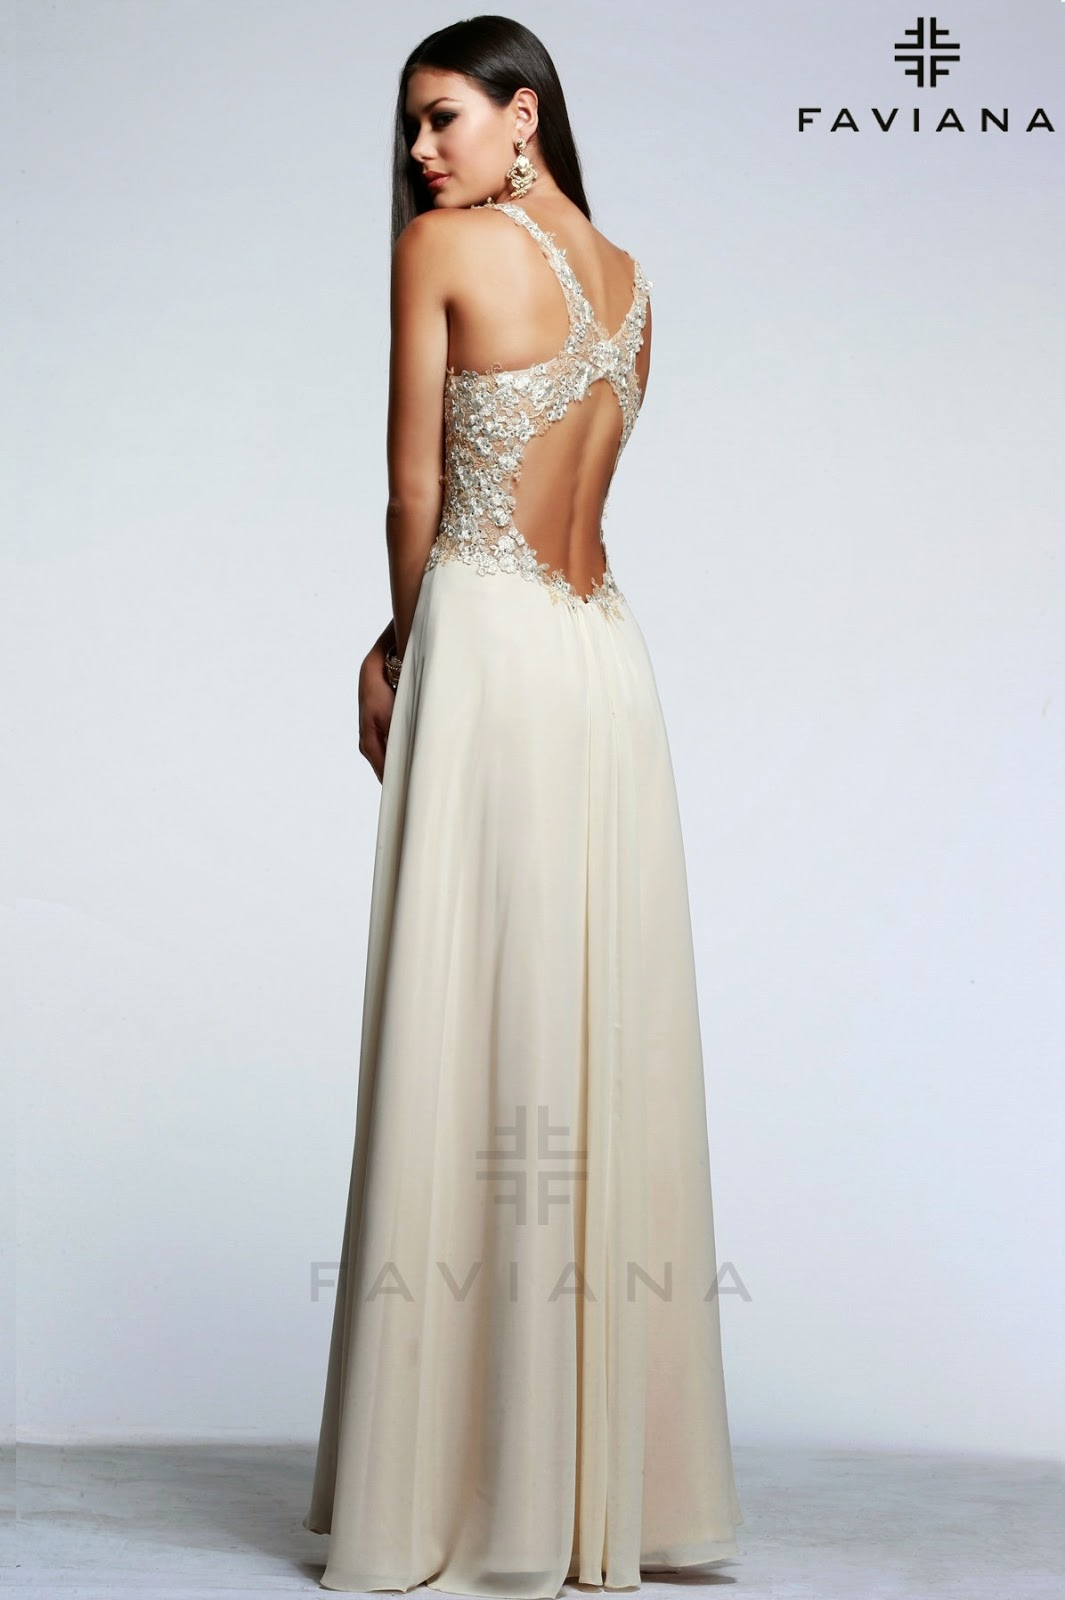 http://www.faviana.com/catalog/dress-s7533?category=white-ivory-collection